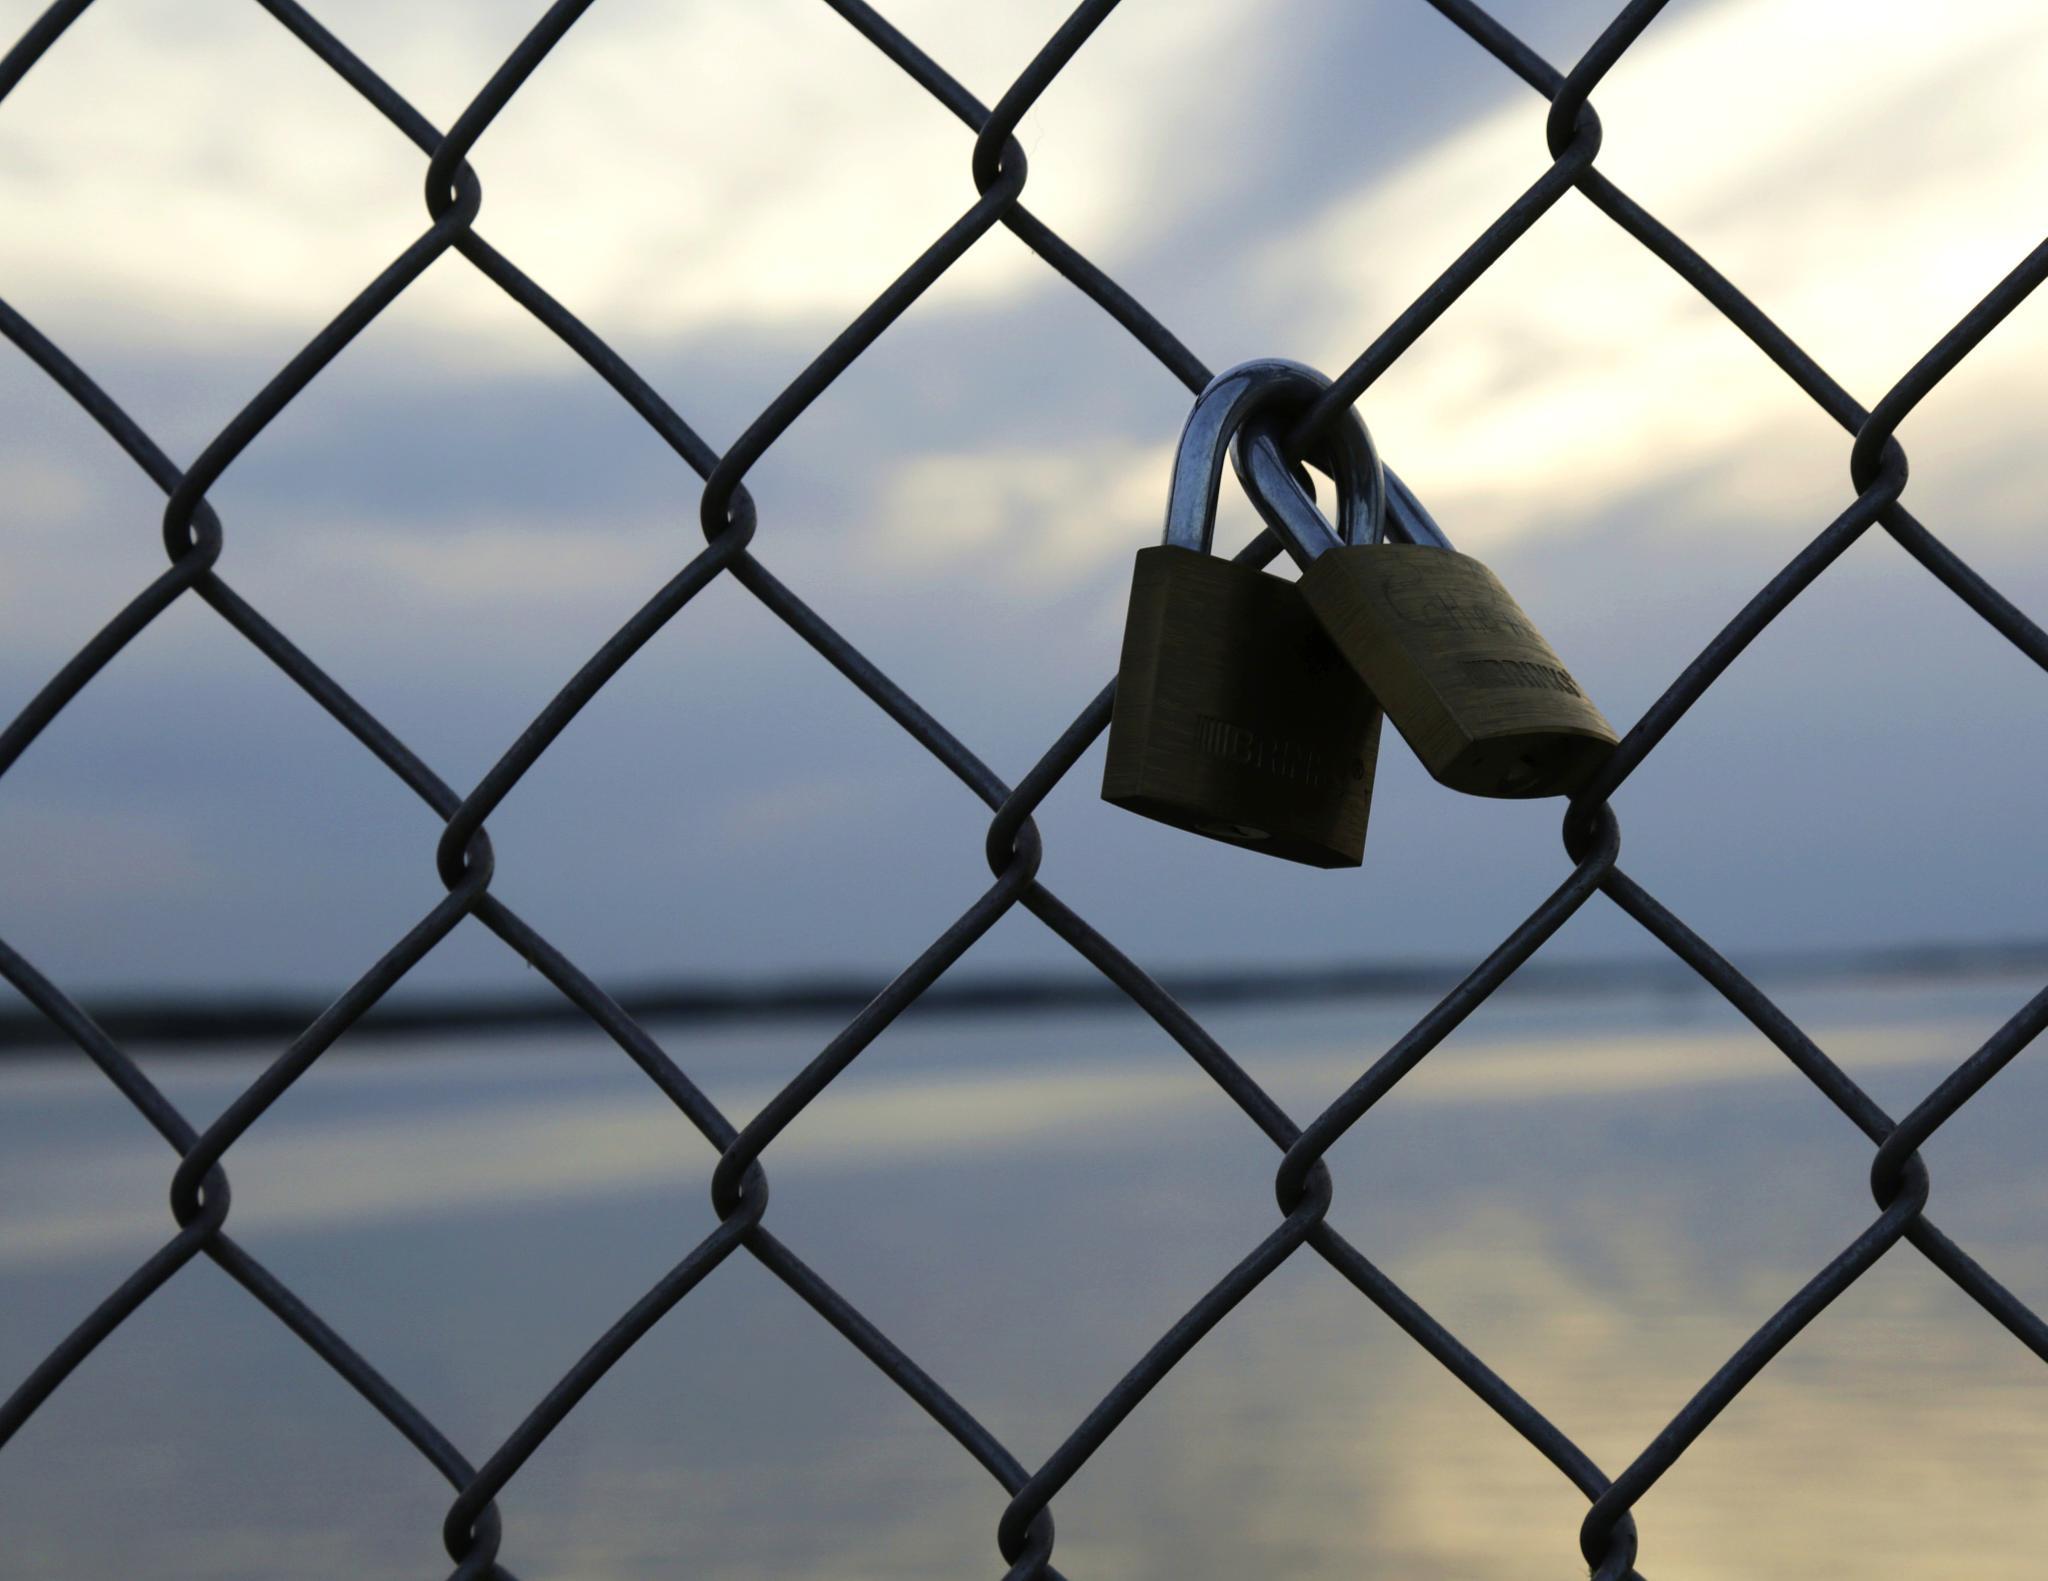 Locked up by Robert Hopkins (Hop) Ridgell